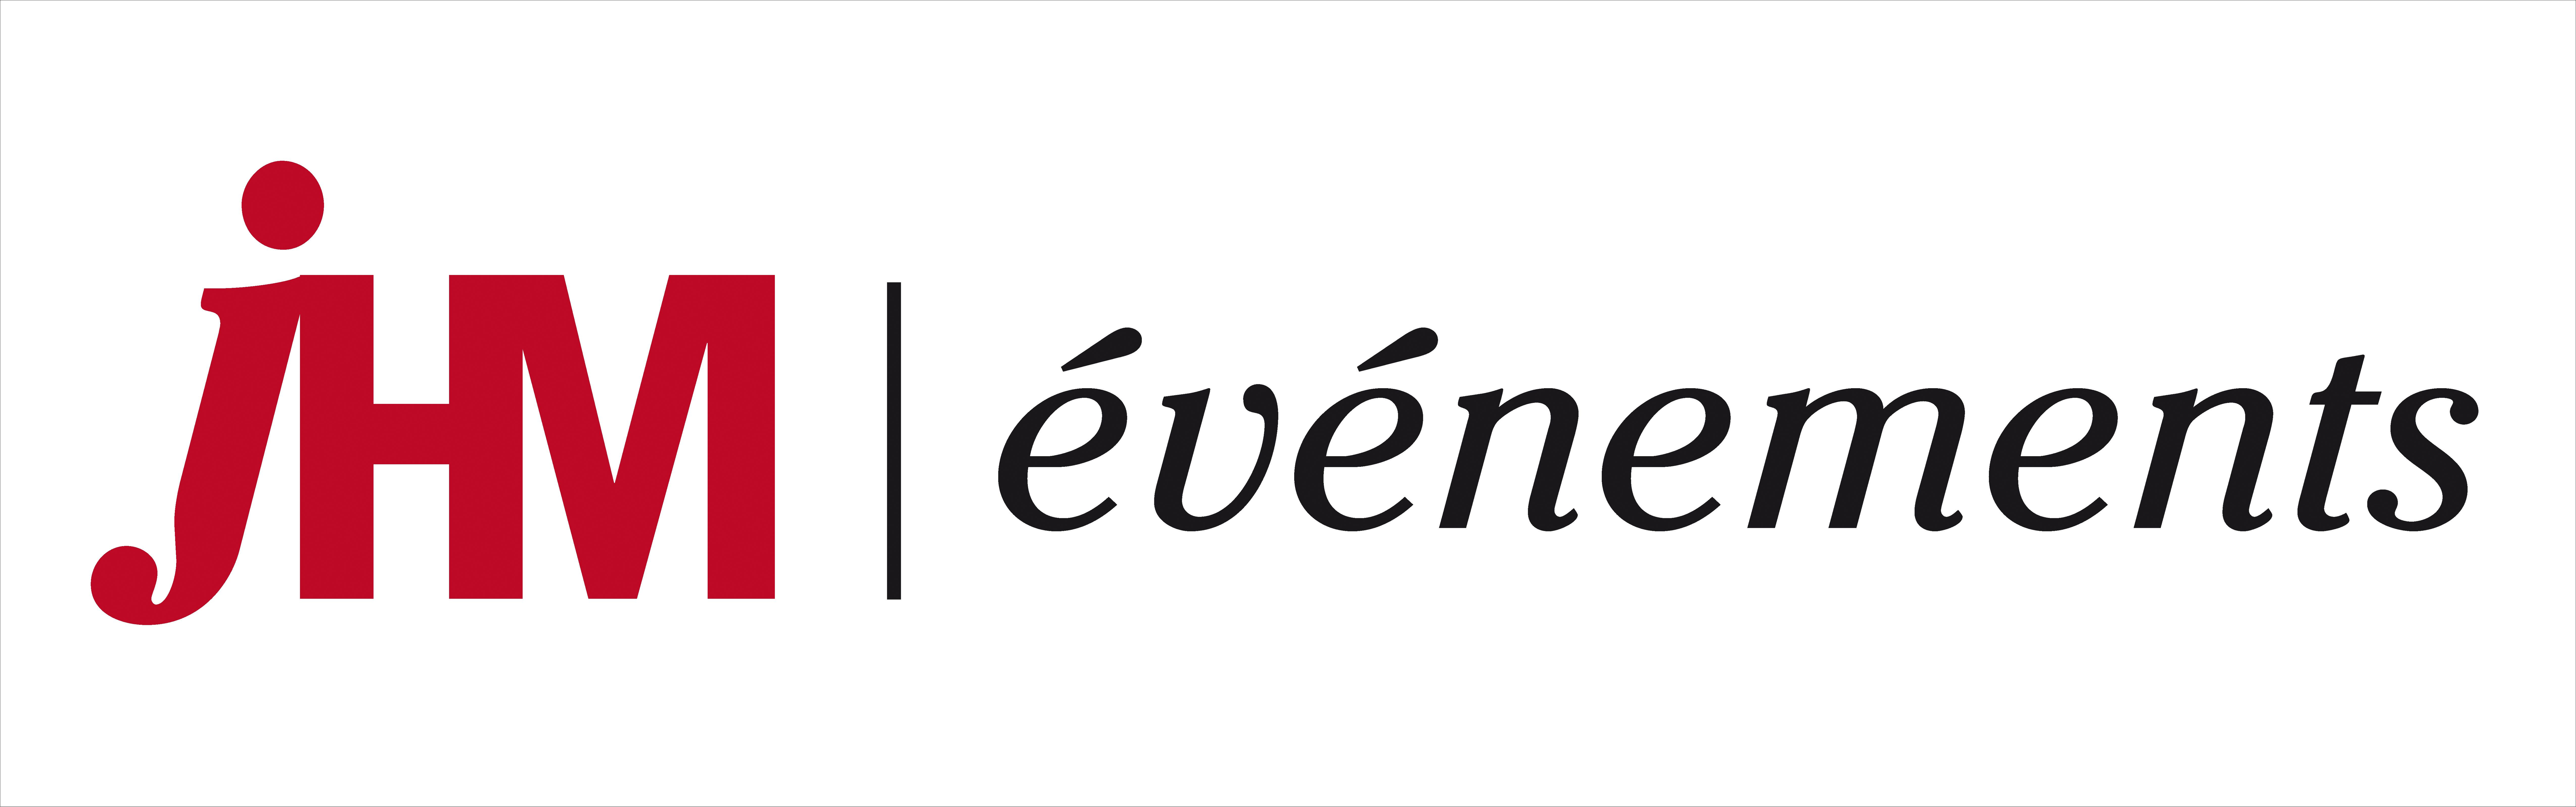 JHM_EVENEMENTS